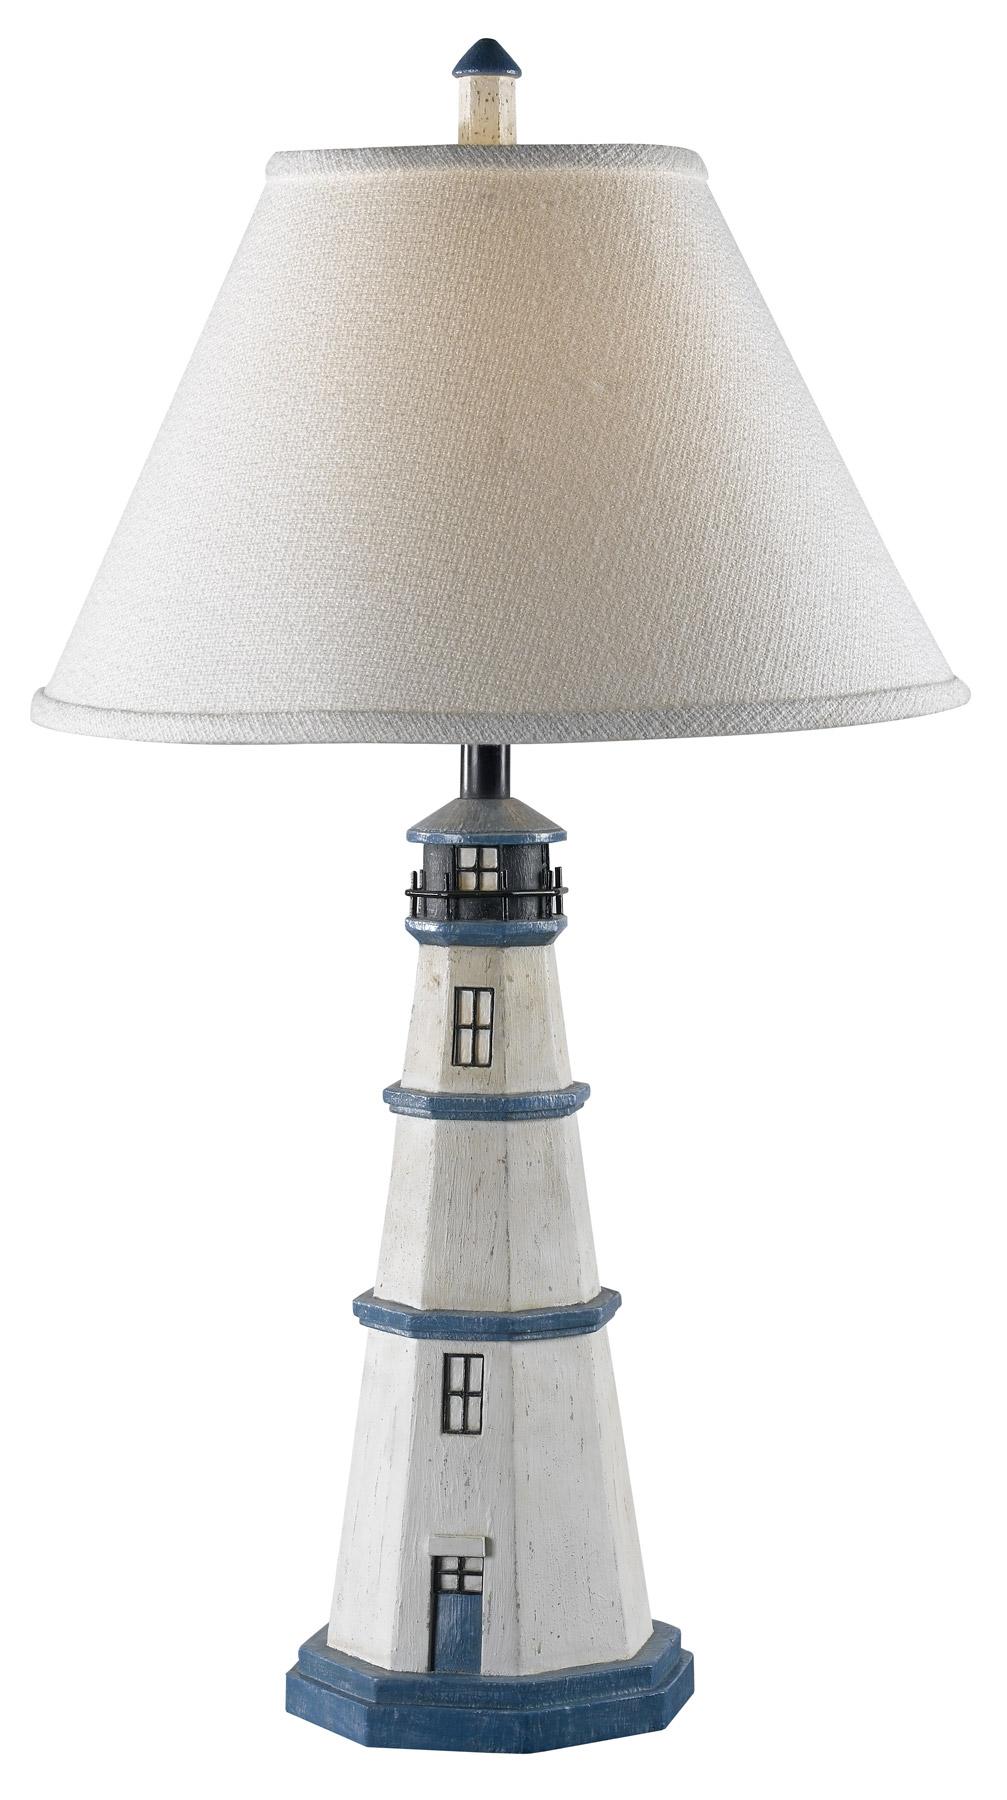 Kenroy home 20140aw nantucket table lamp - Kenay home lamparas ...